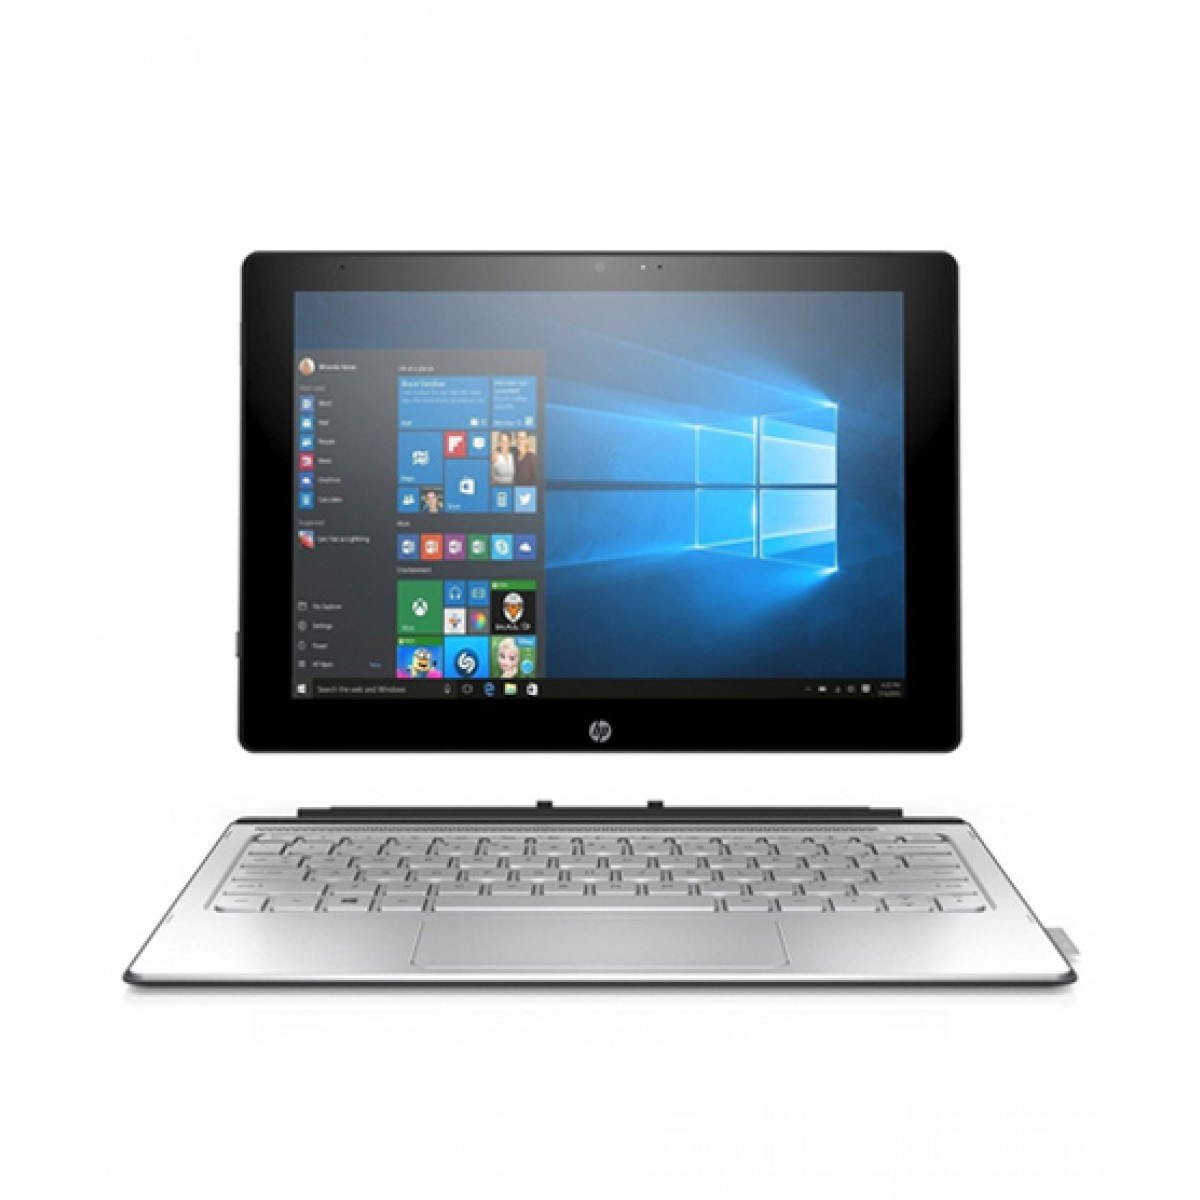 "HP Spectre X2 12"" Core m3-6Y30 6th Generation Dual-Core Touch Laptop"